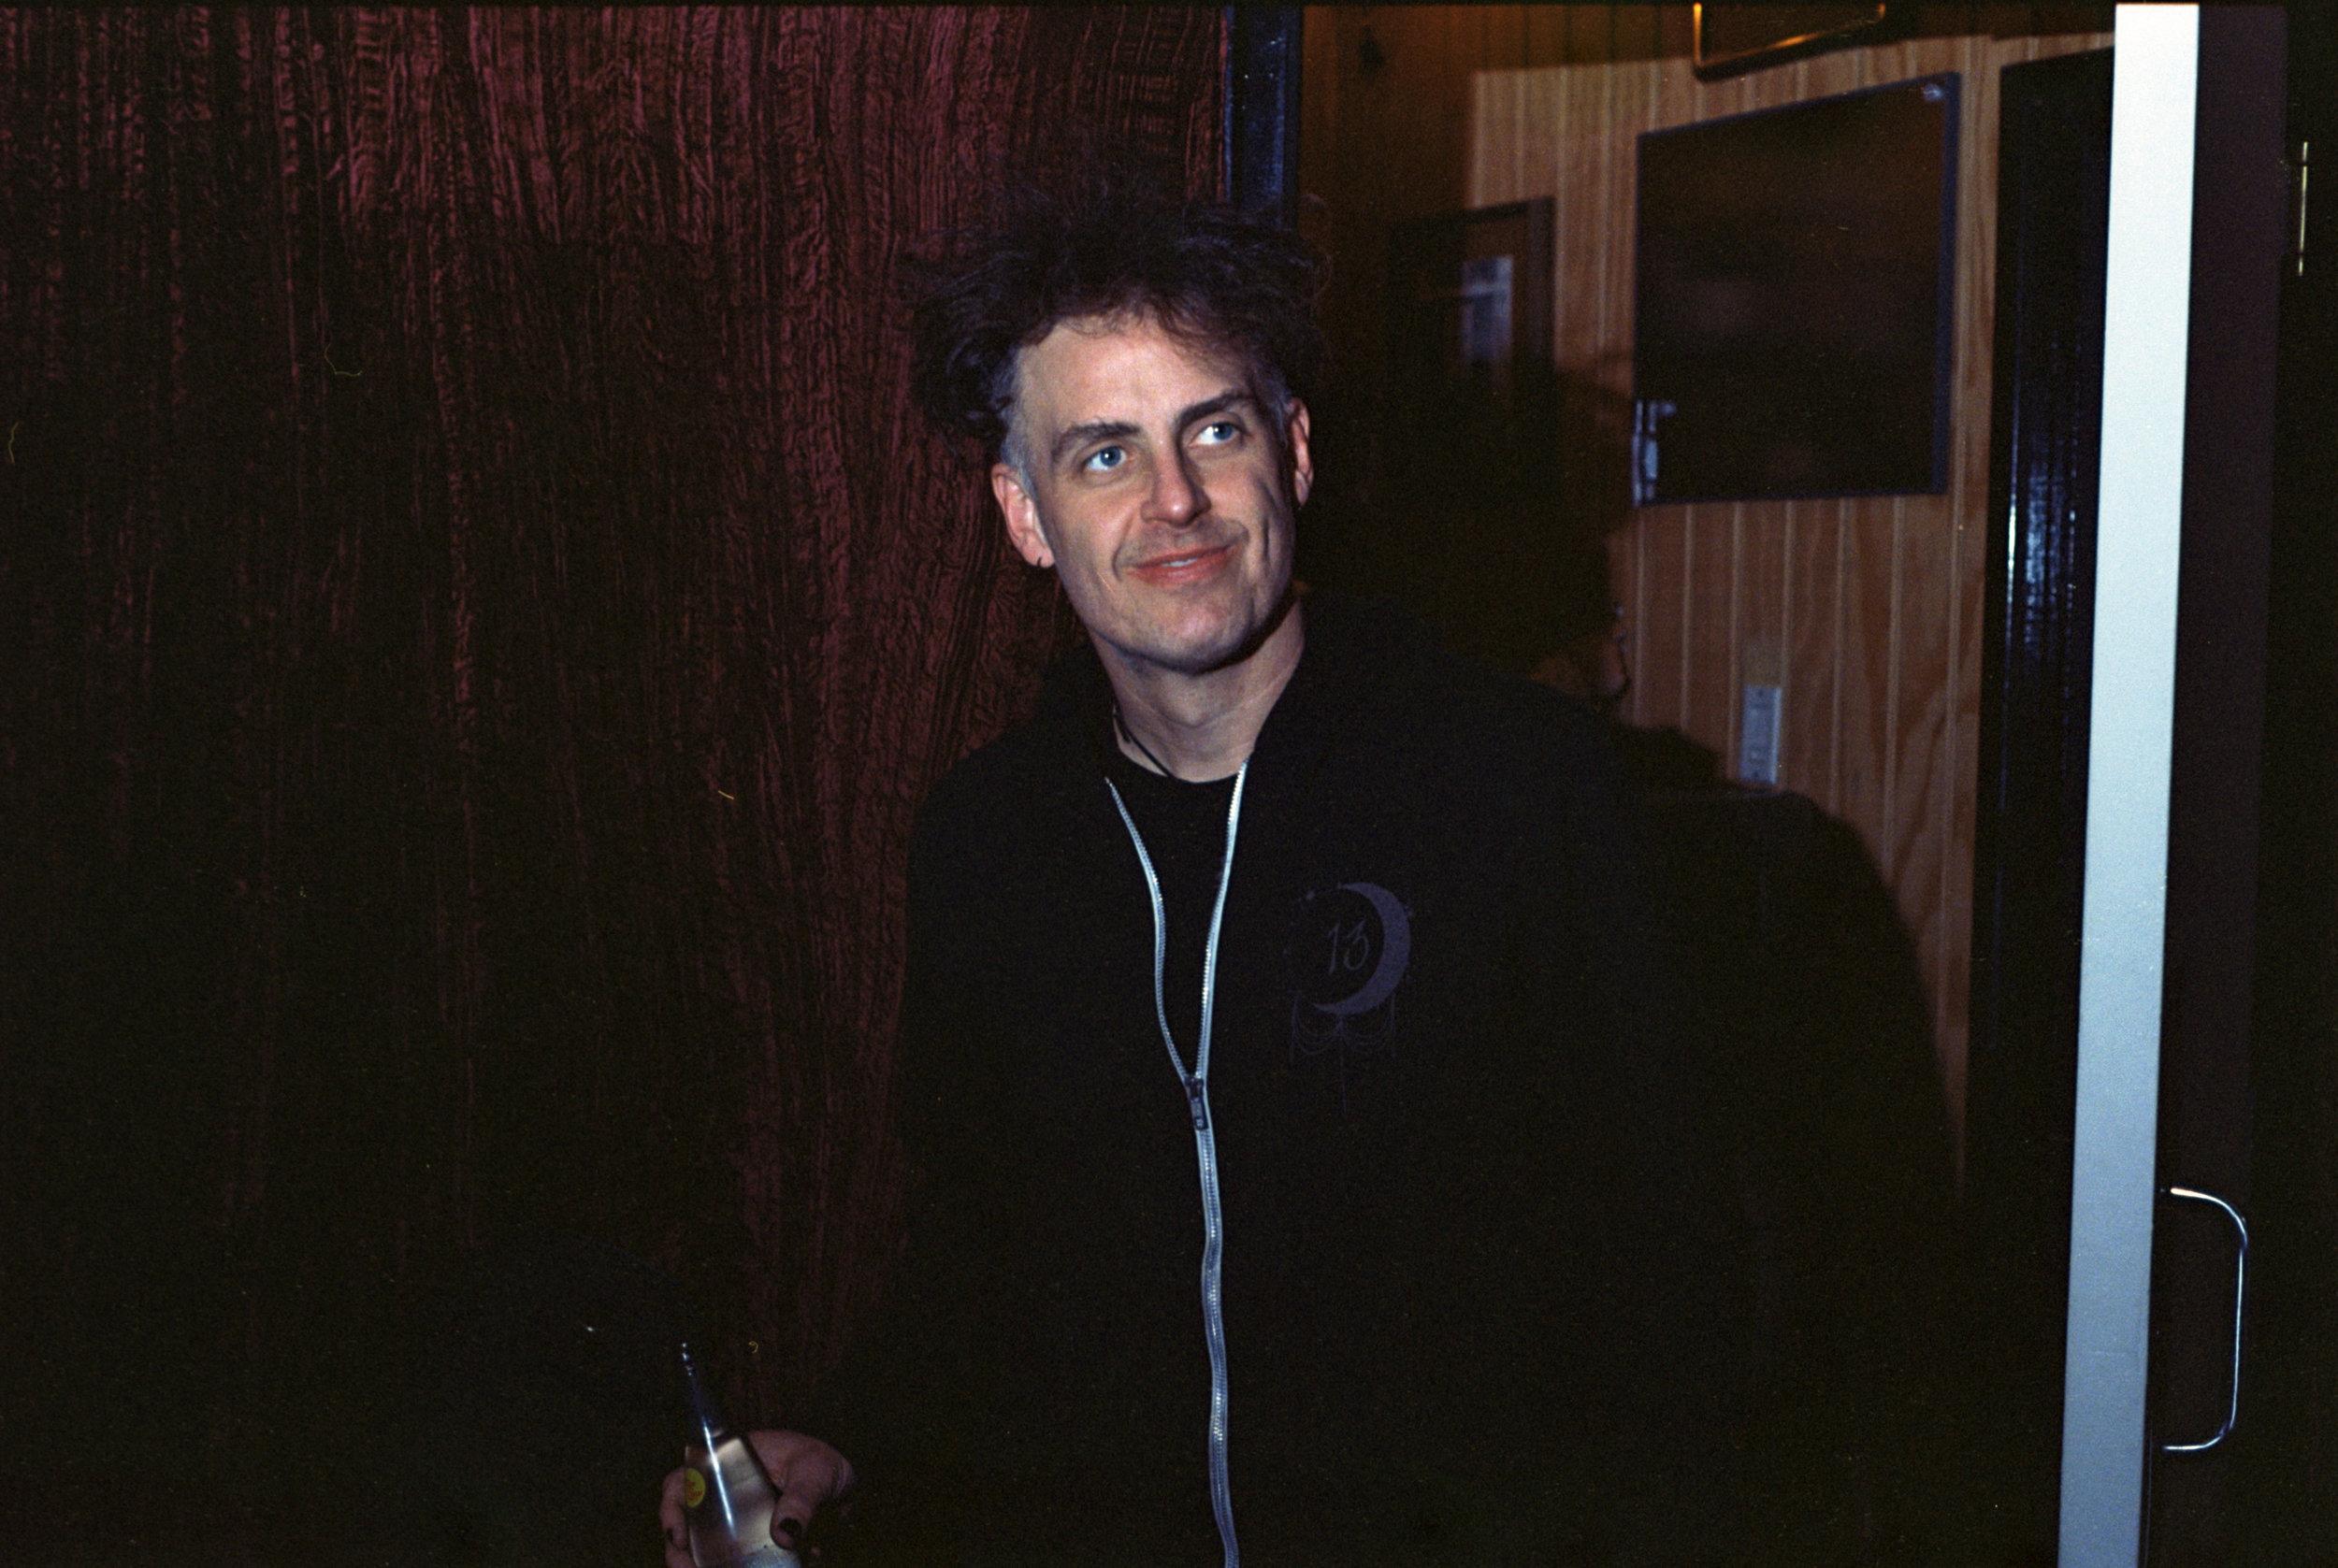 Bassist Devin Hoff (Photo by Devin O'Brien)